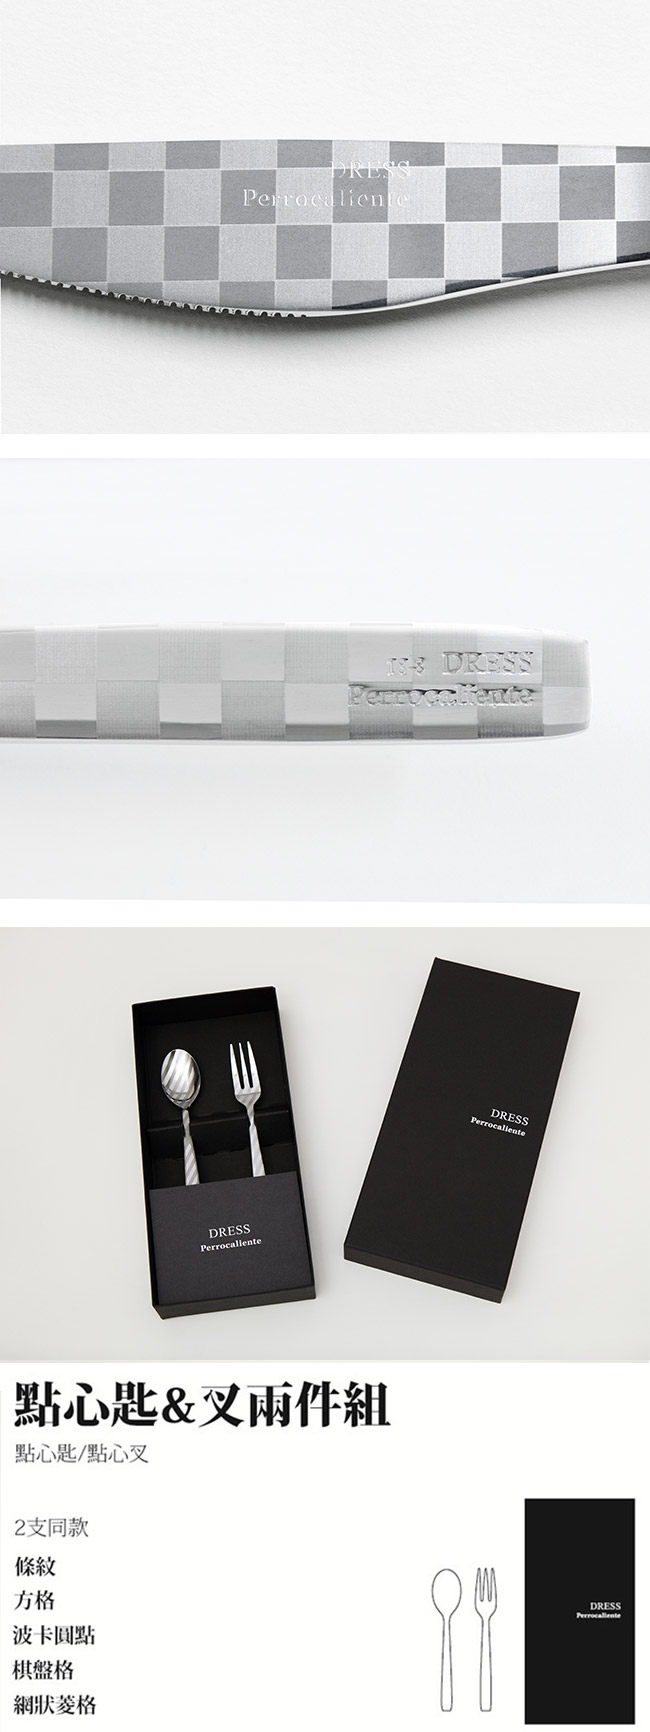 Perrocaliente Dress Gift Set 銀色盒裝餐具組 點心匙&叉兩件組 棋盤格